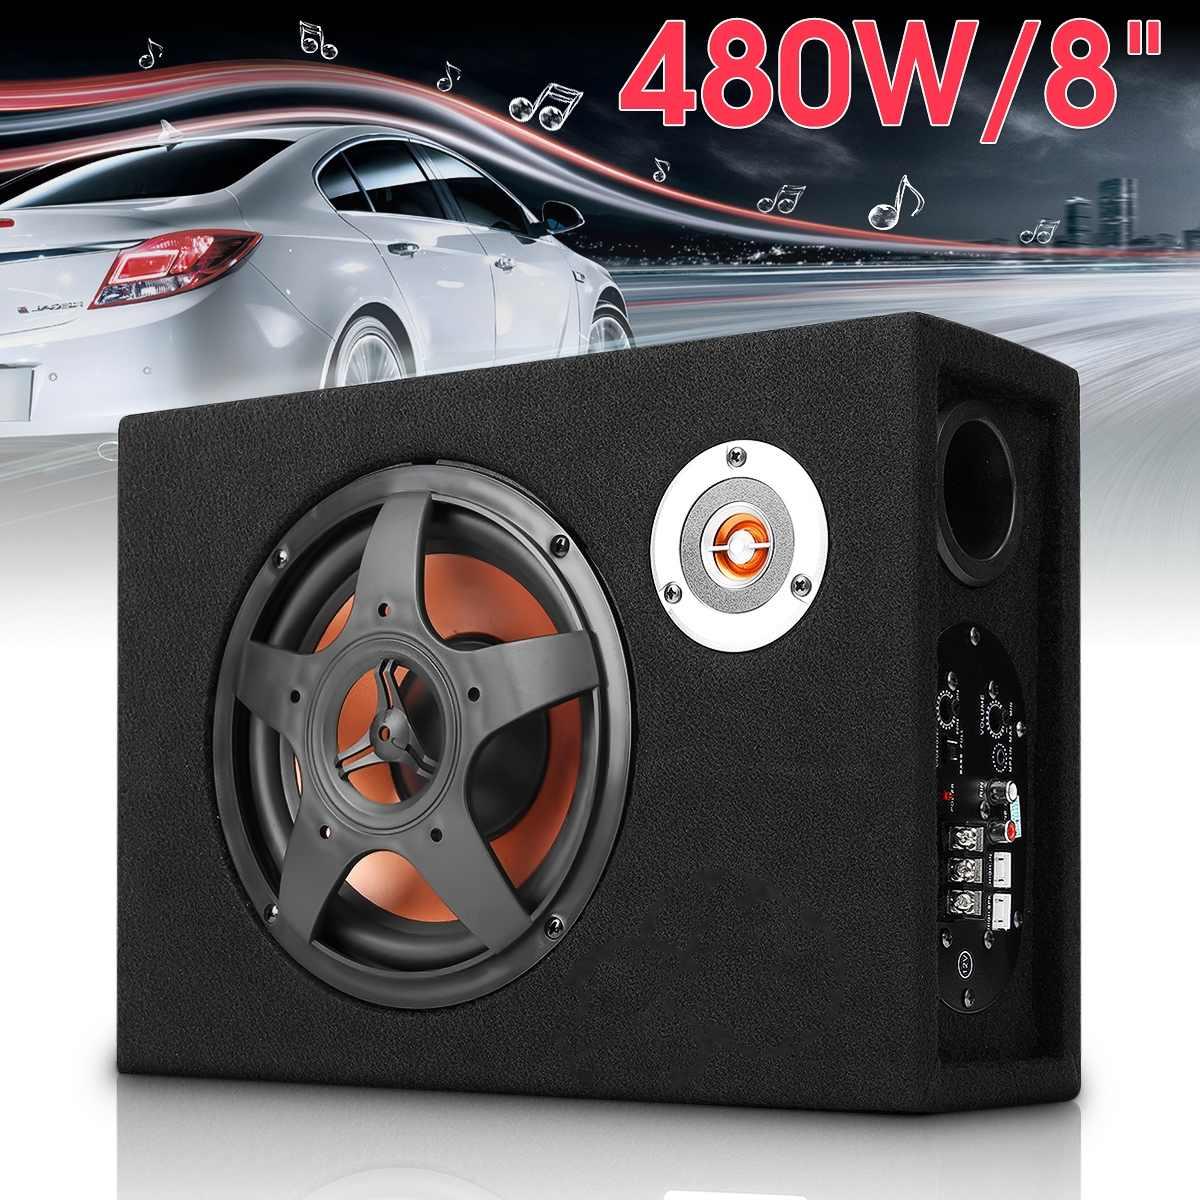 Mini 8 Inch Car Ultra Thin Under-Seat Subwoofer Speaker 480W Vehicle Car Subwoofer Modified Speaker Stereo Audio Bass AmplifierMini 8 Inch Car Ultra Thin Under-Seat Subwoofer Speaker 480W Vehicle Car Subwoofer Modified Speaker Stereo Audio Bass Amplifier